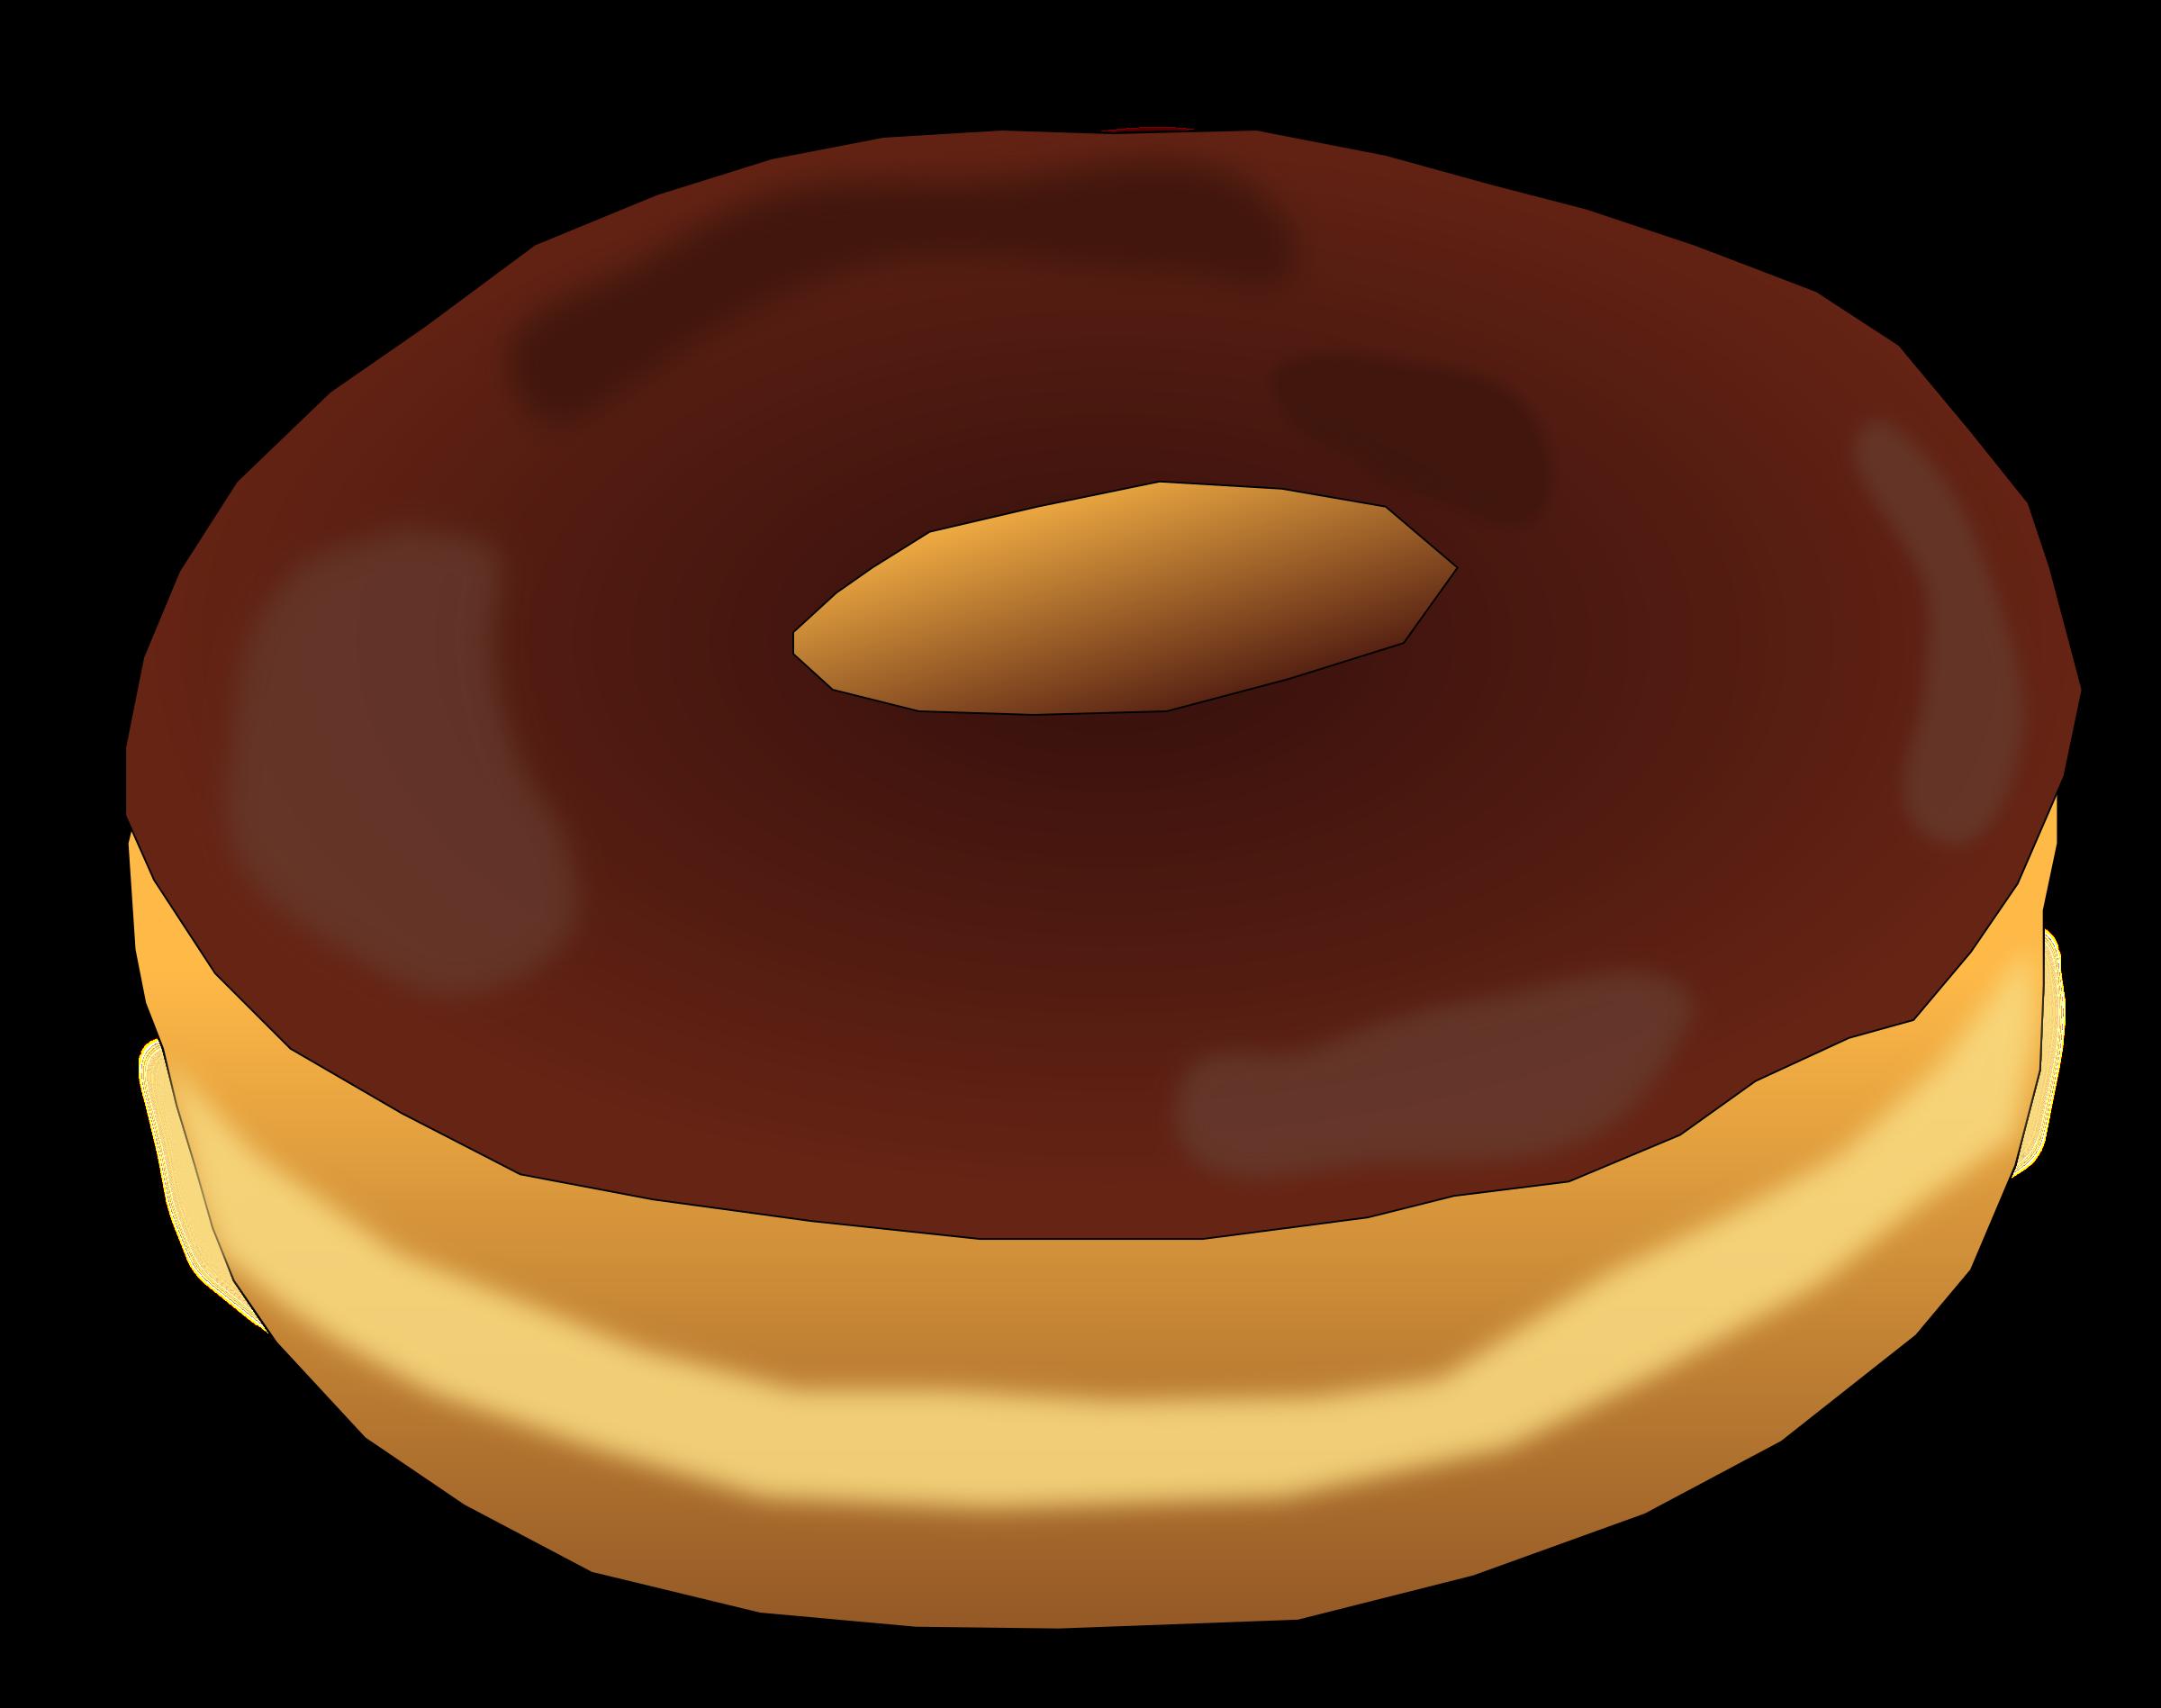 Plain donut big image. Doughnut clipart food